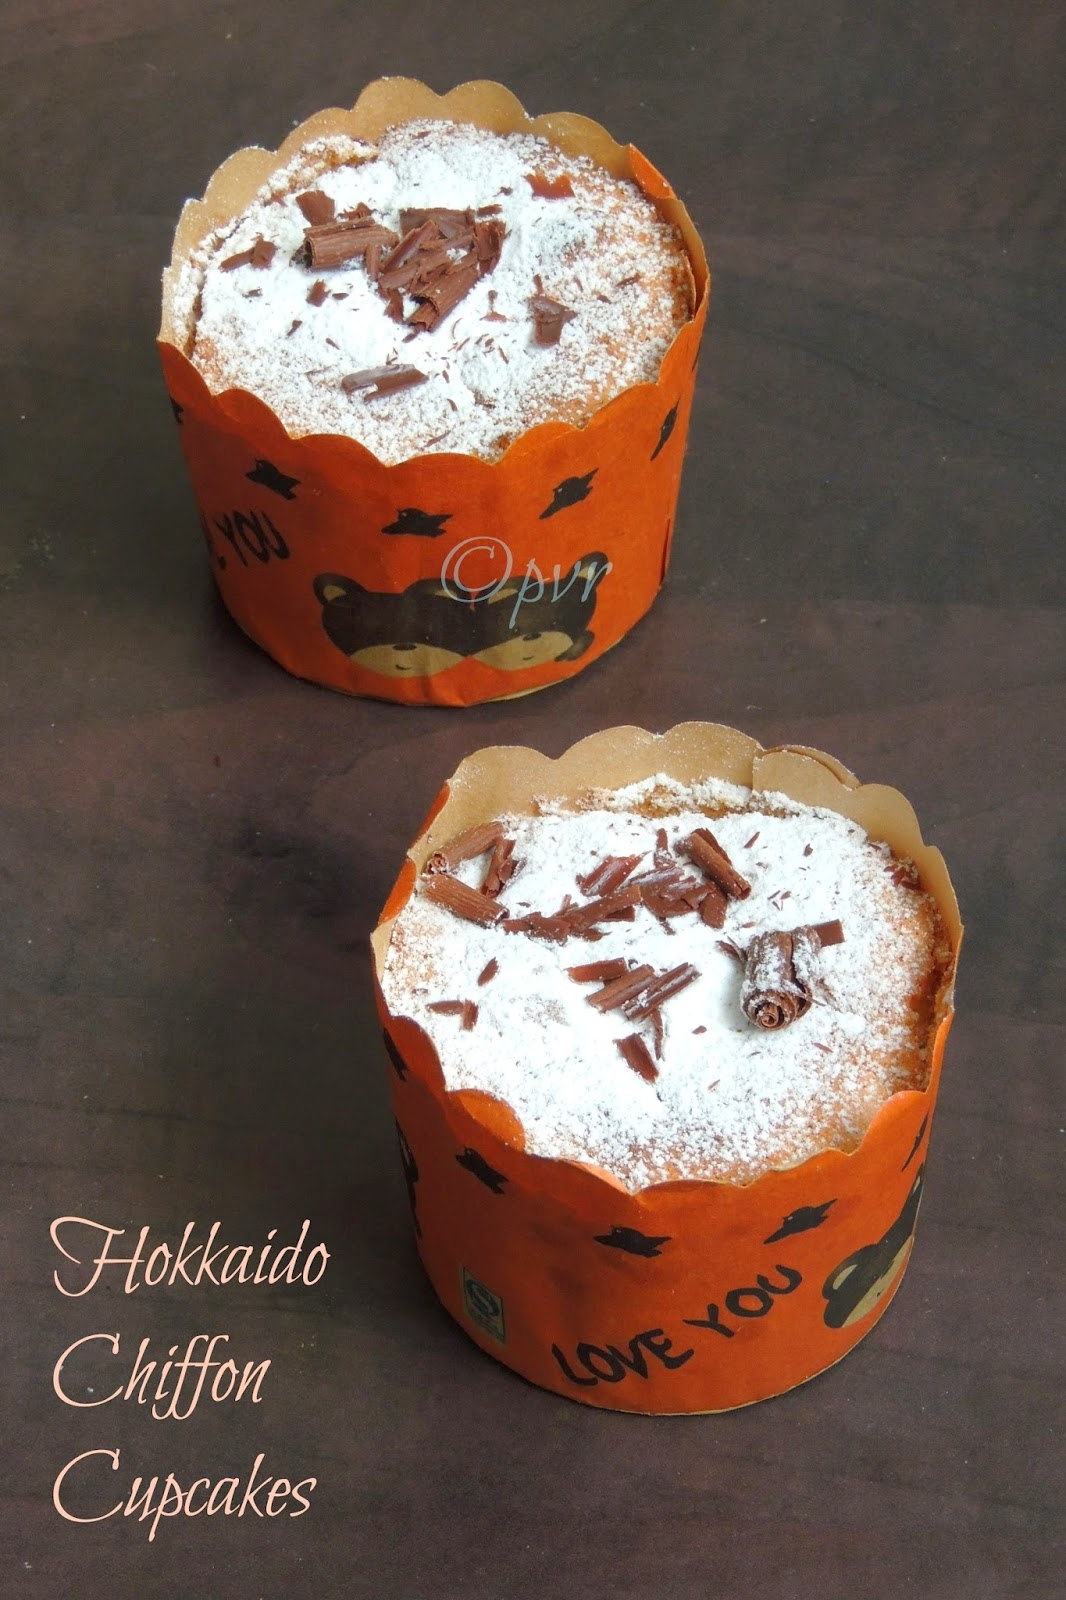 Hokkaida chiffon cupcakes